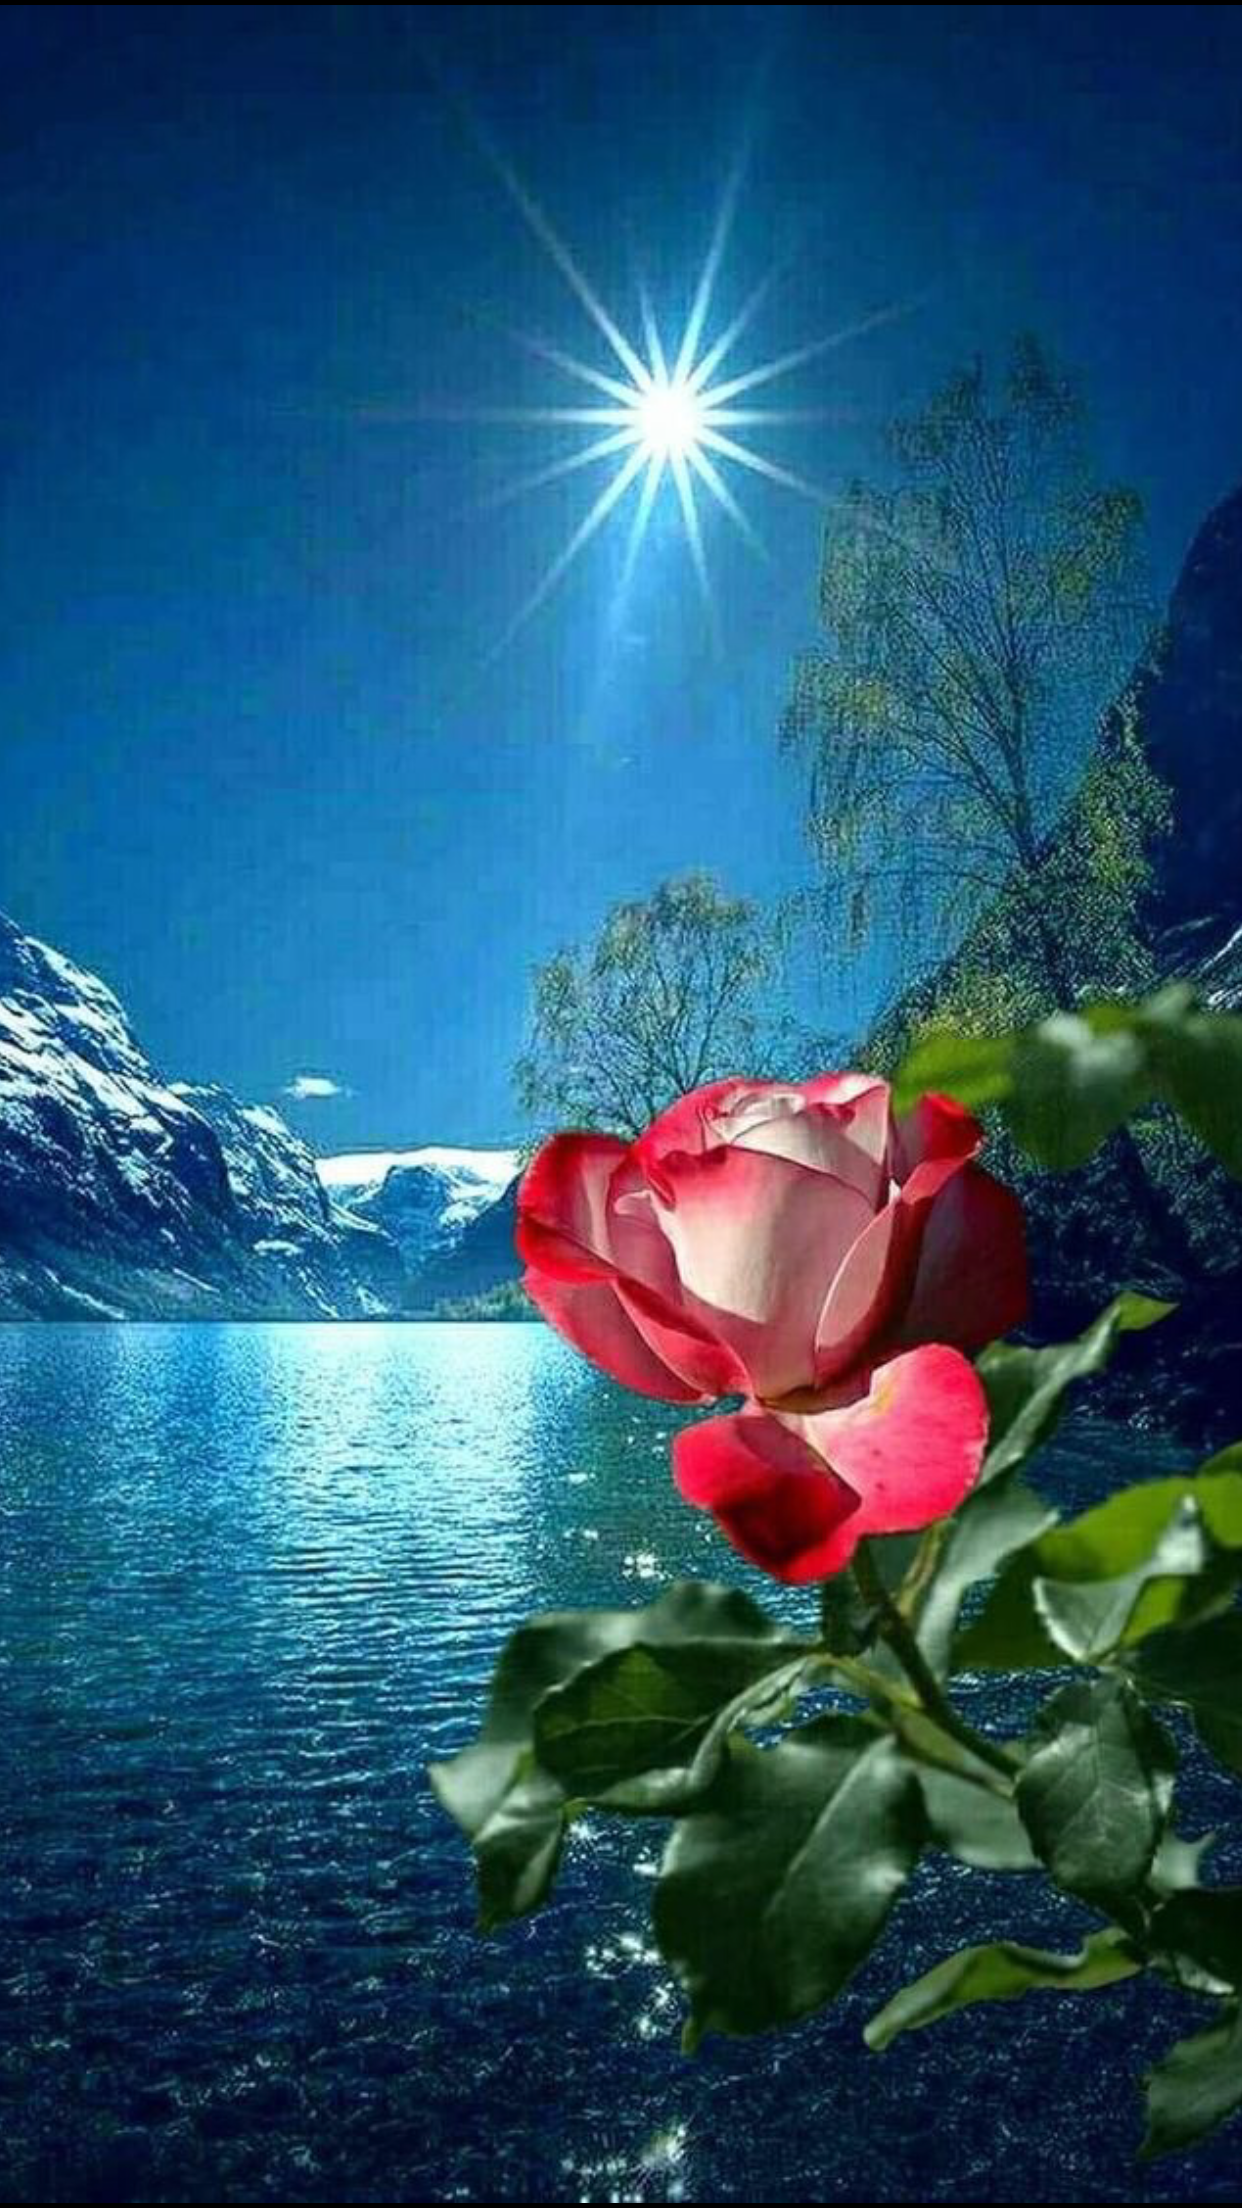 Pin By Shmuel On Big Love Beautiful Flowers Wallpapers Beautiful Nature Beautiful Places Nature